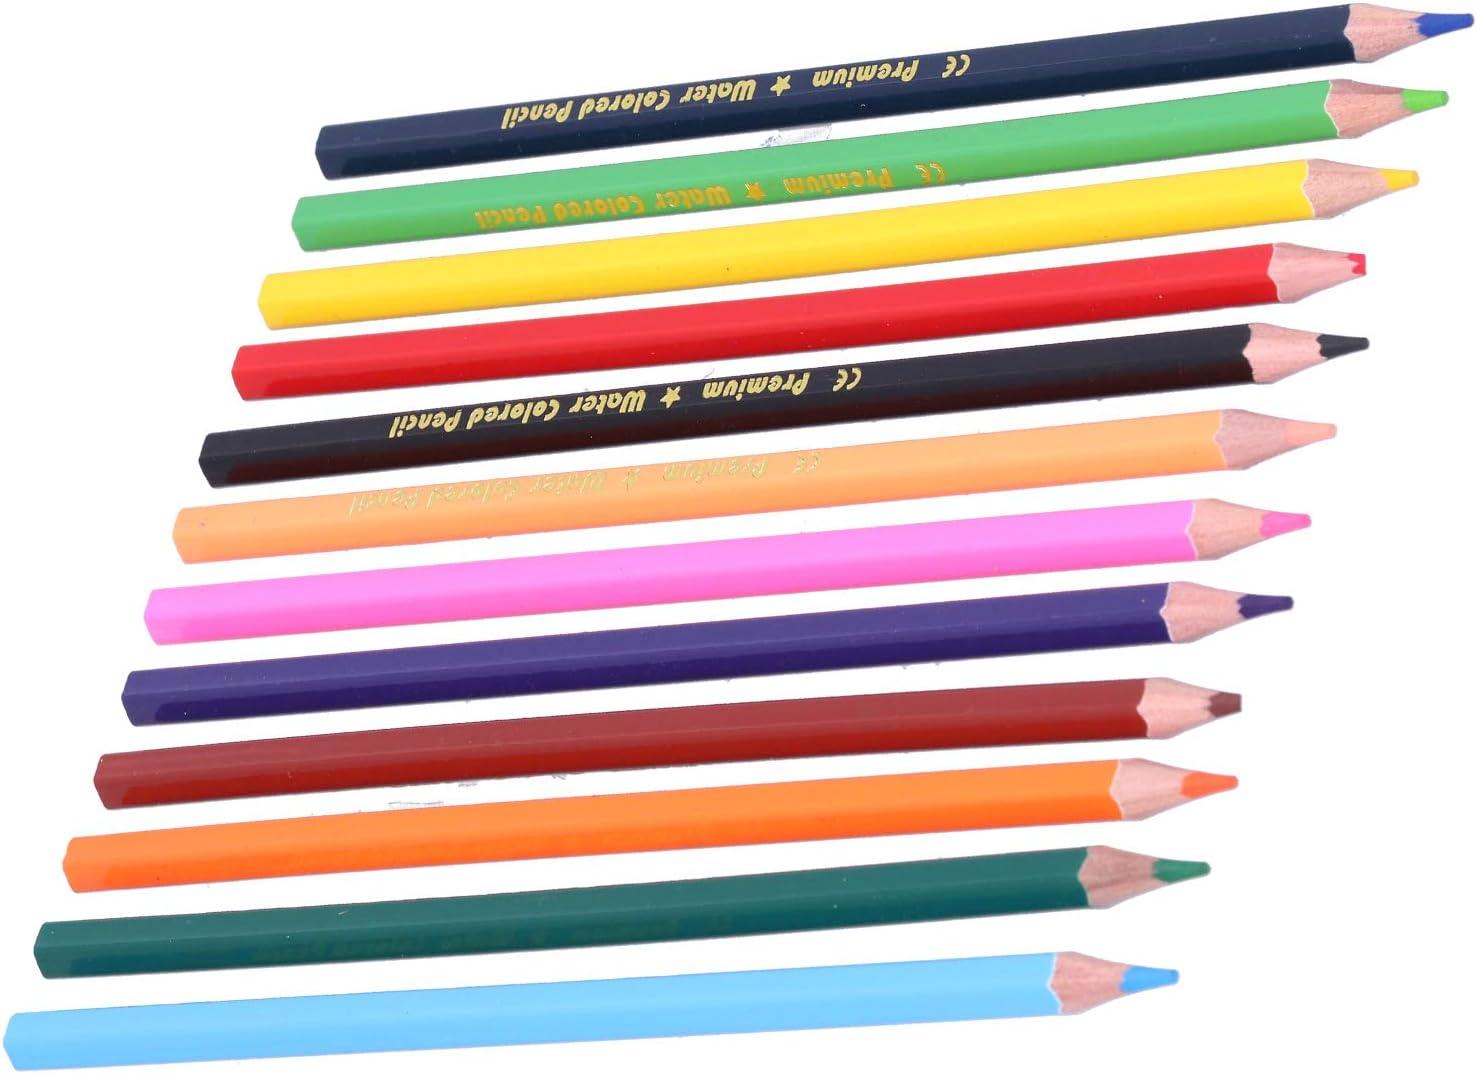 Pencils Set 2021 Fine Long Beach Mall Refill Painting Color Supplies Pen Art Drawing